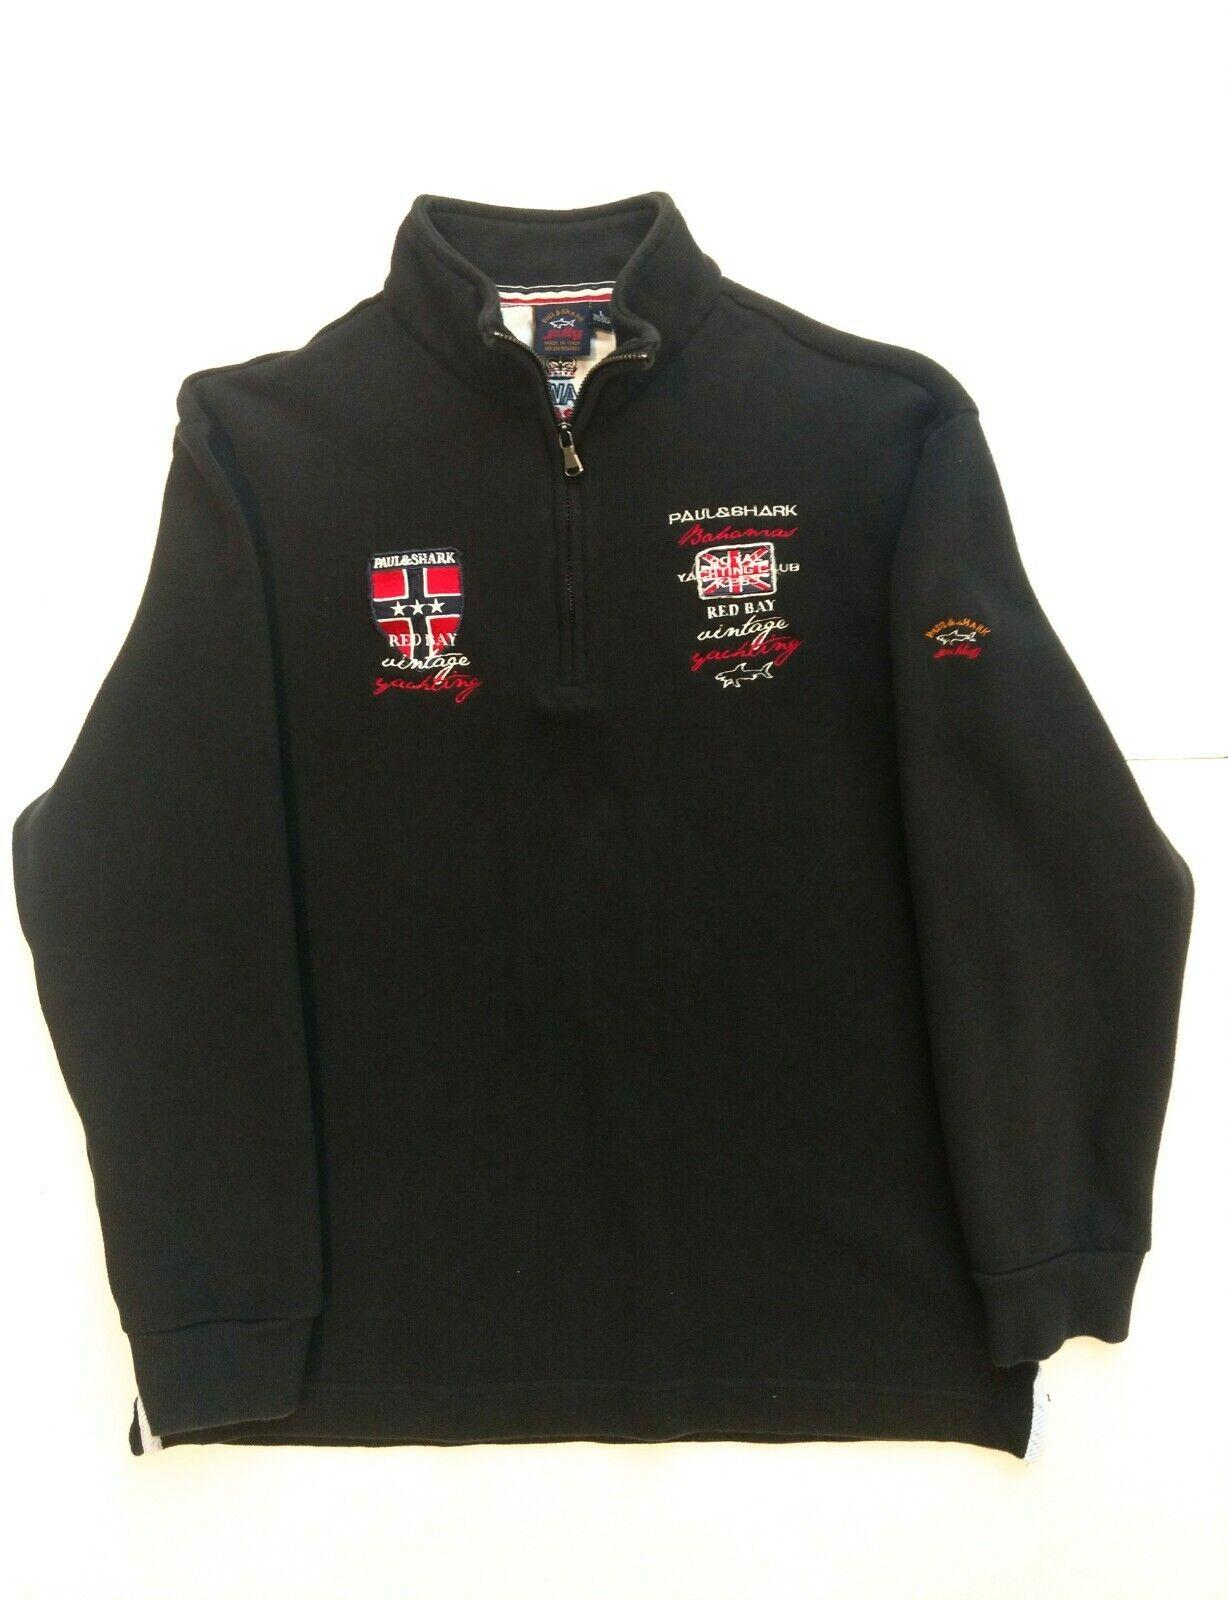 Paul & Shark 1 4 Zip Navy Sweater L